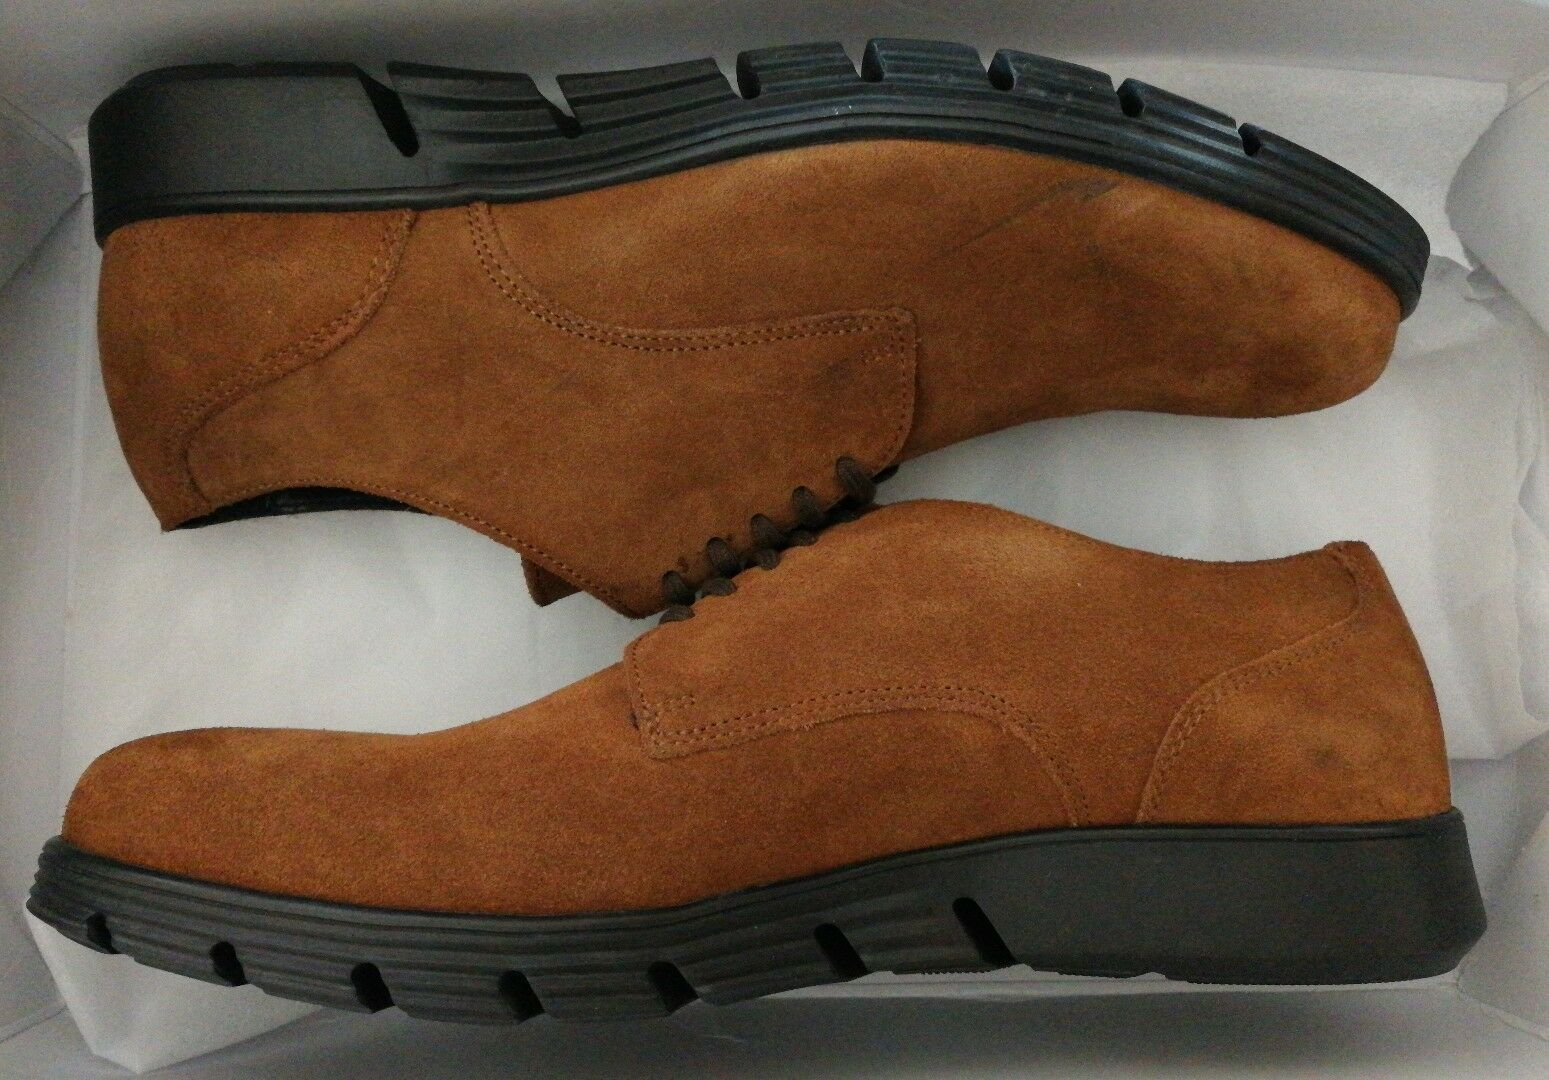 FLORSHEIM Größe Suede Lace-up Schuhe Braun Größe FLORSHEIM uk 8 eu 42 6a81dc